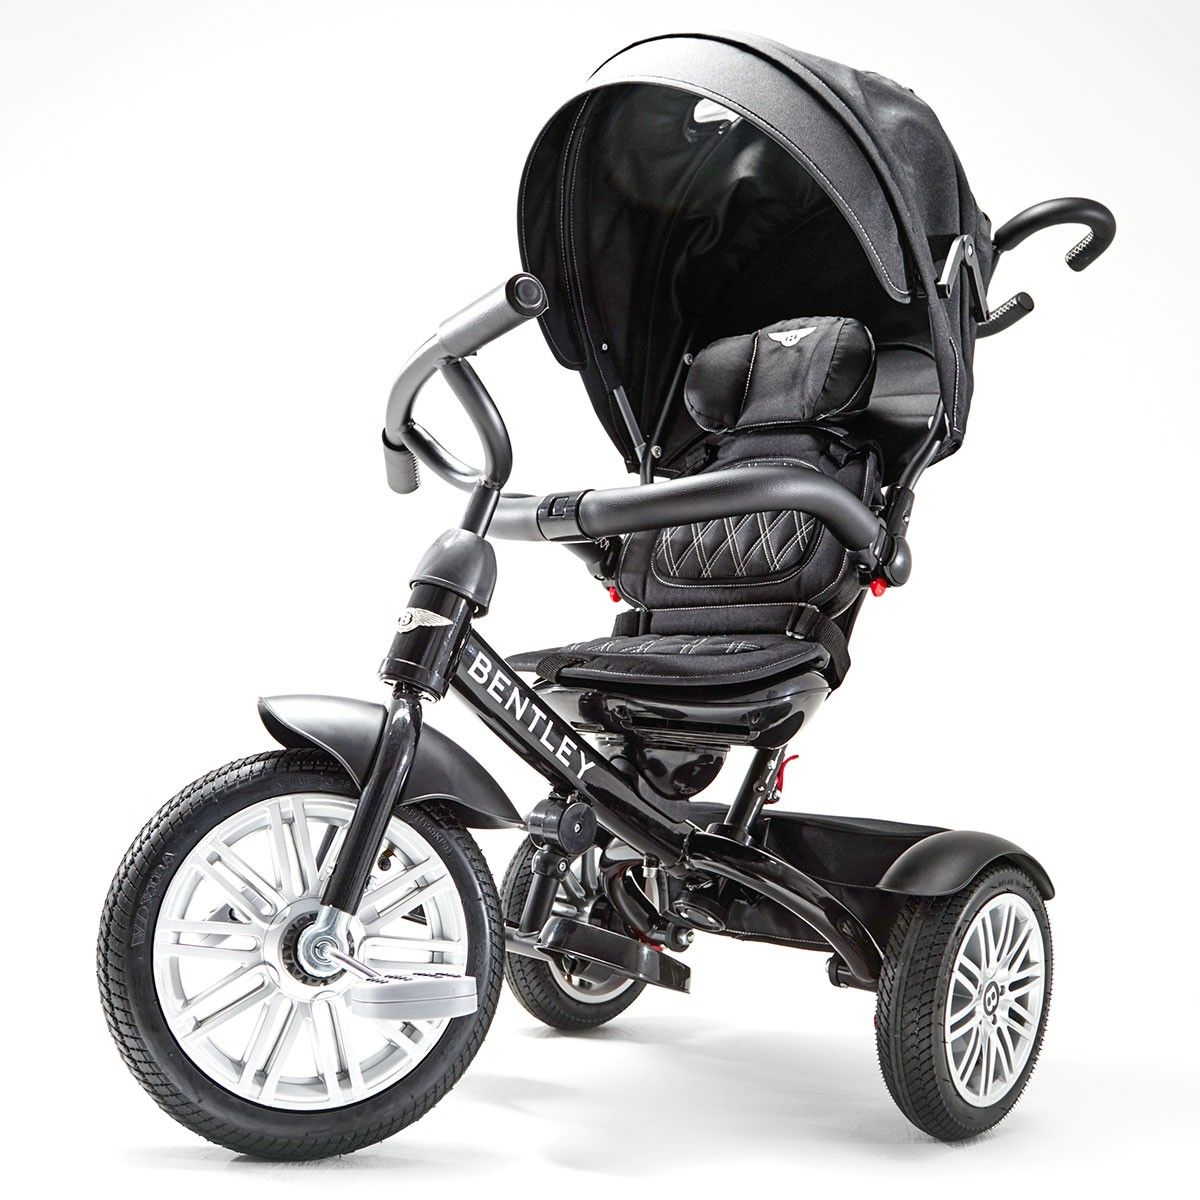 Bentley 6in1 Baby Stroller and Tricycle. YEAHH, Bentley